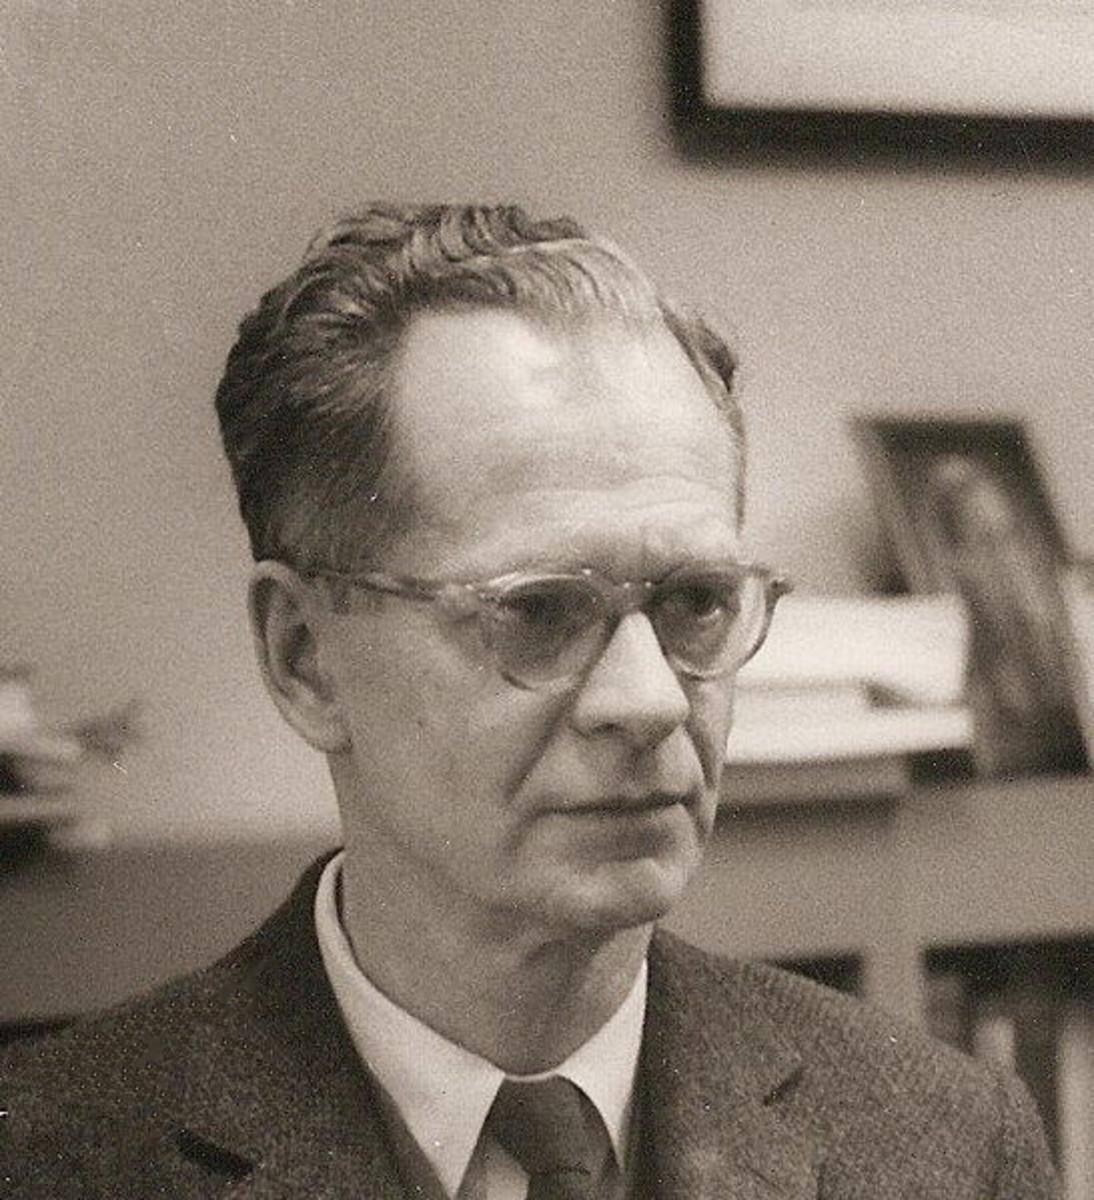 Skinner at Harvard c 1950. Image from Wikipedia